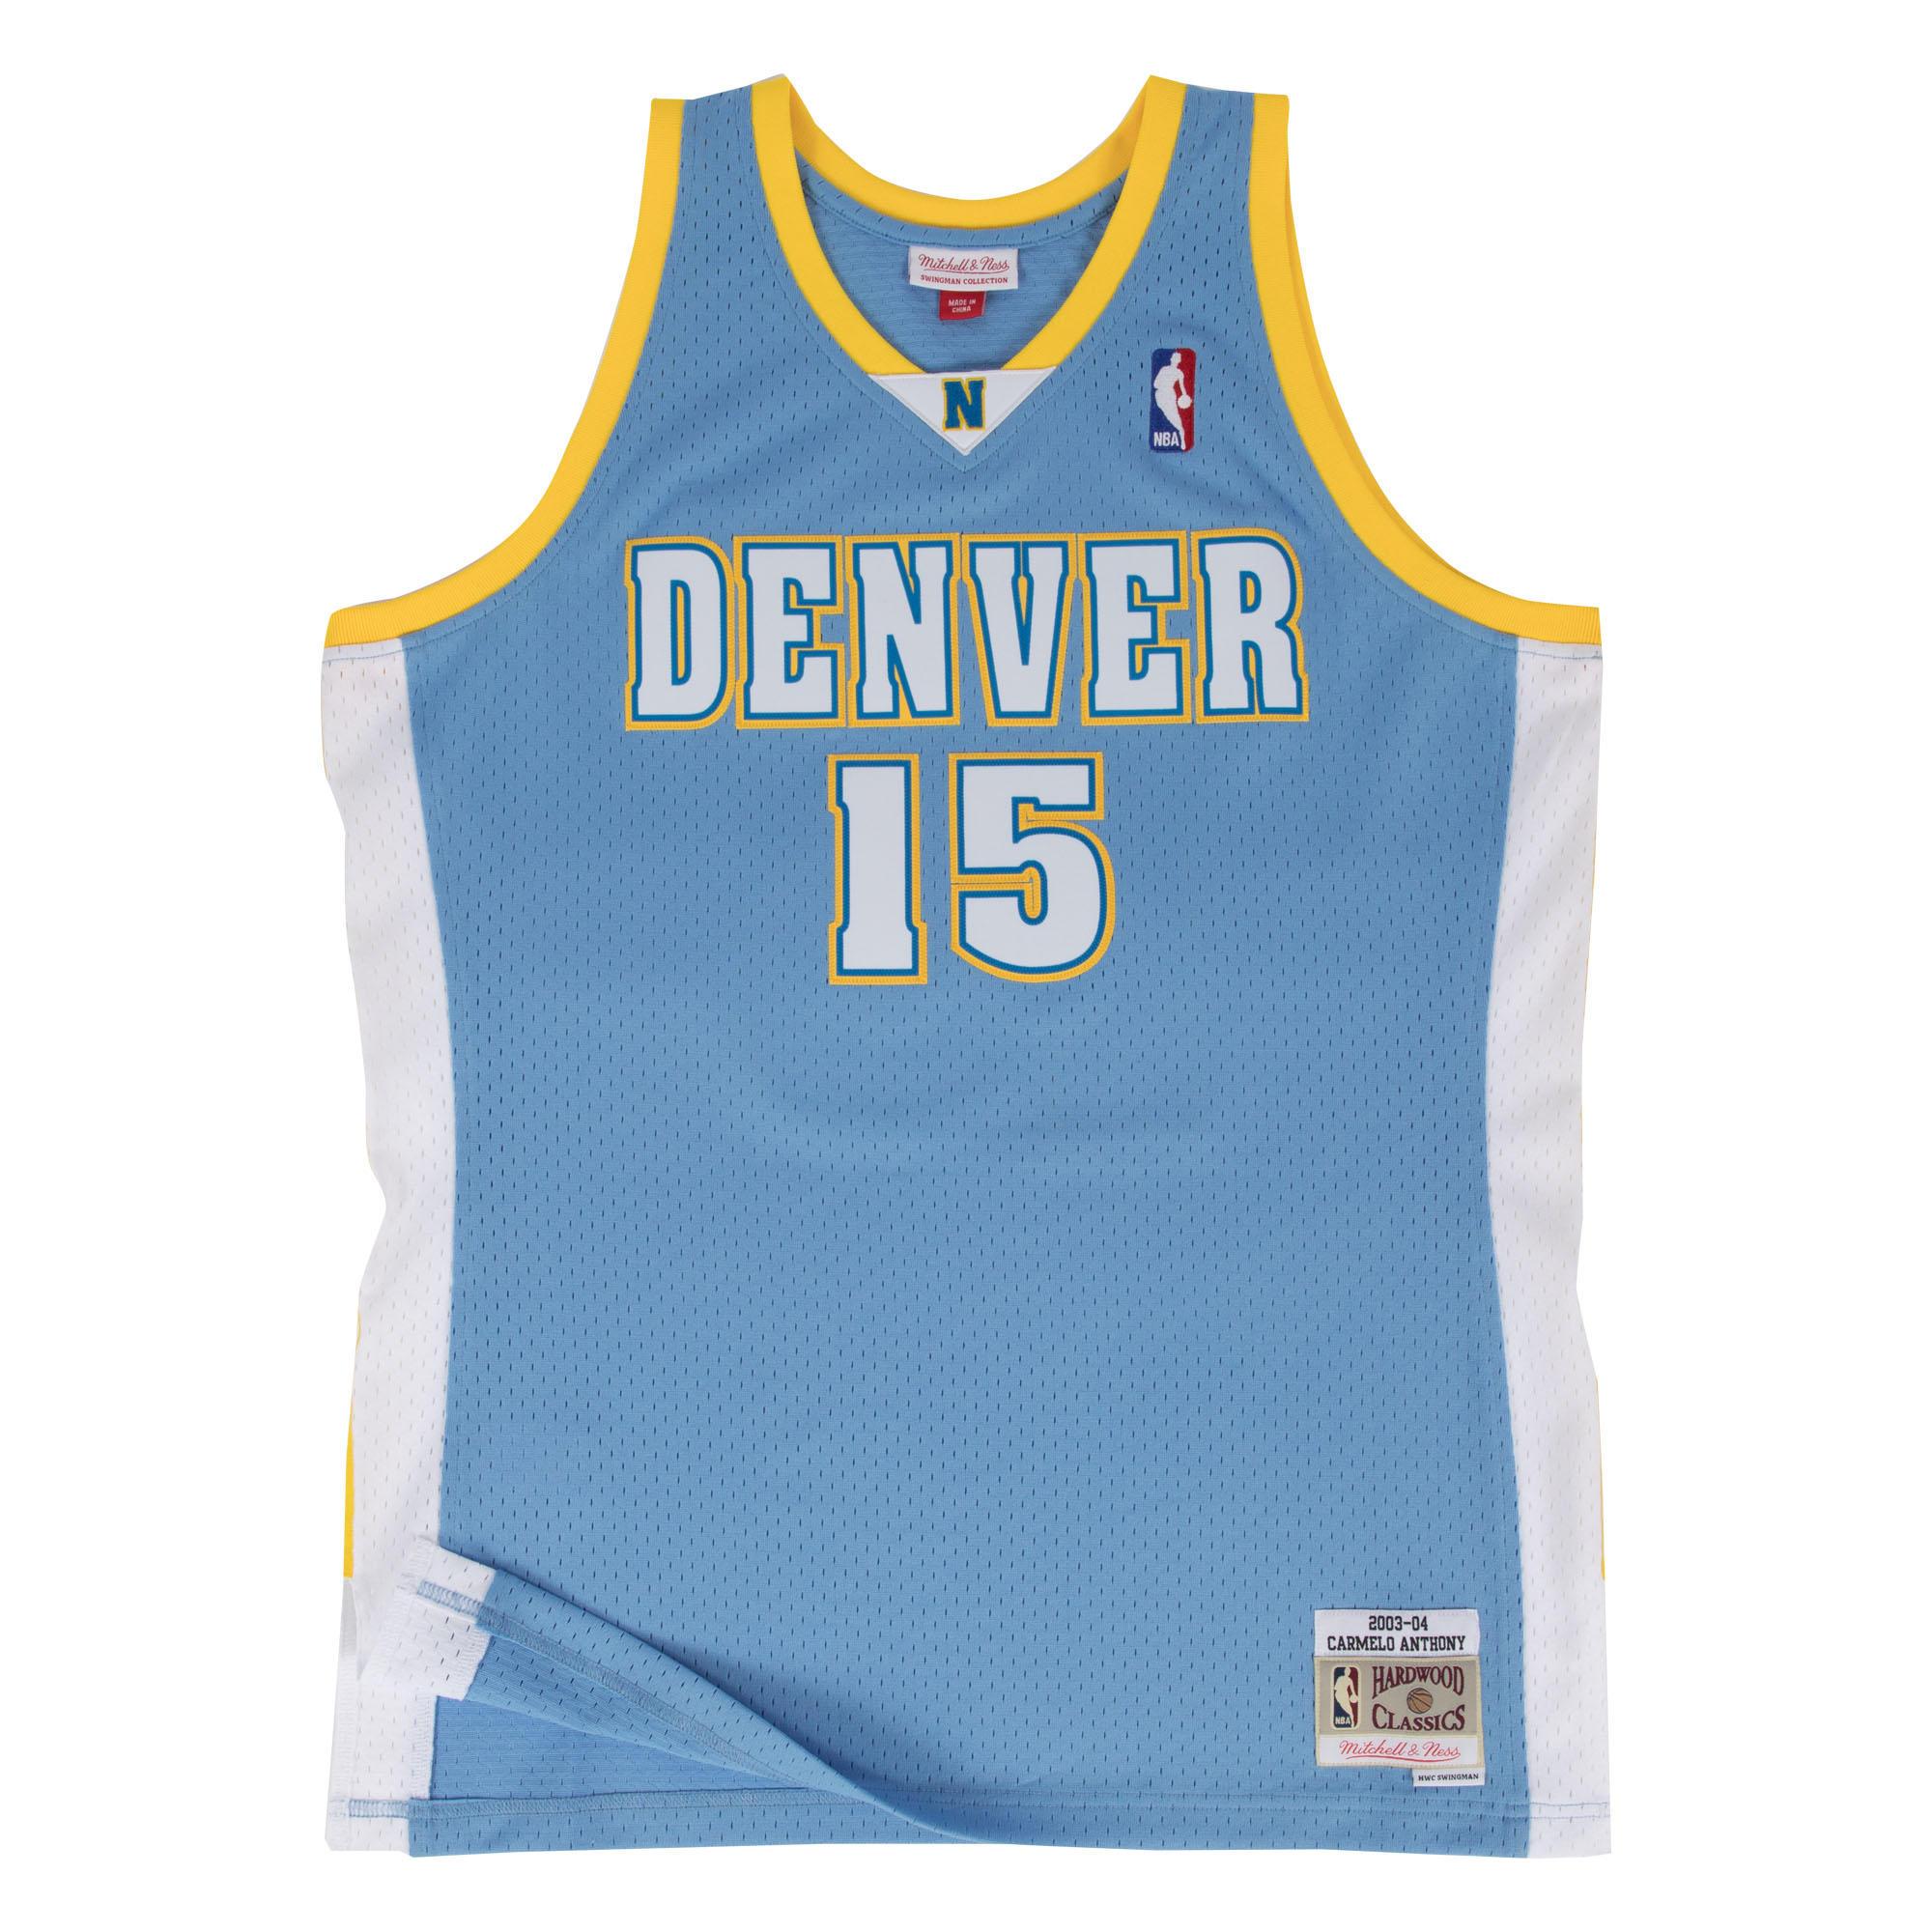 Denver Nuggets New Jersey: Denver Nuggets Blue Carmelo Anthony 2003